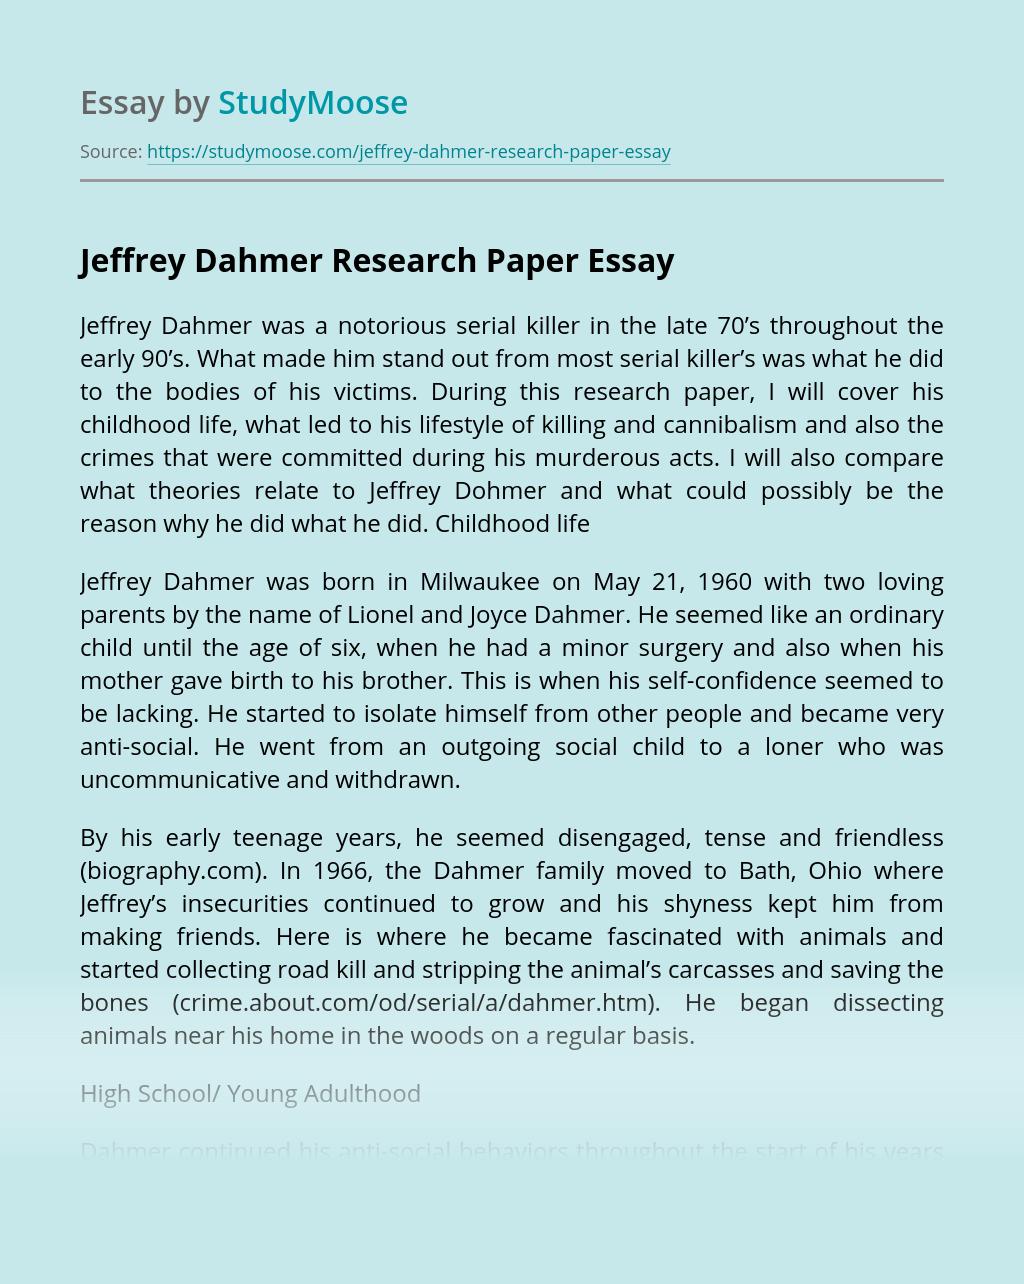 Jeffrey Dahmer Research Paper